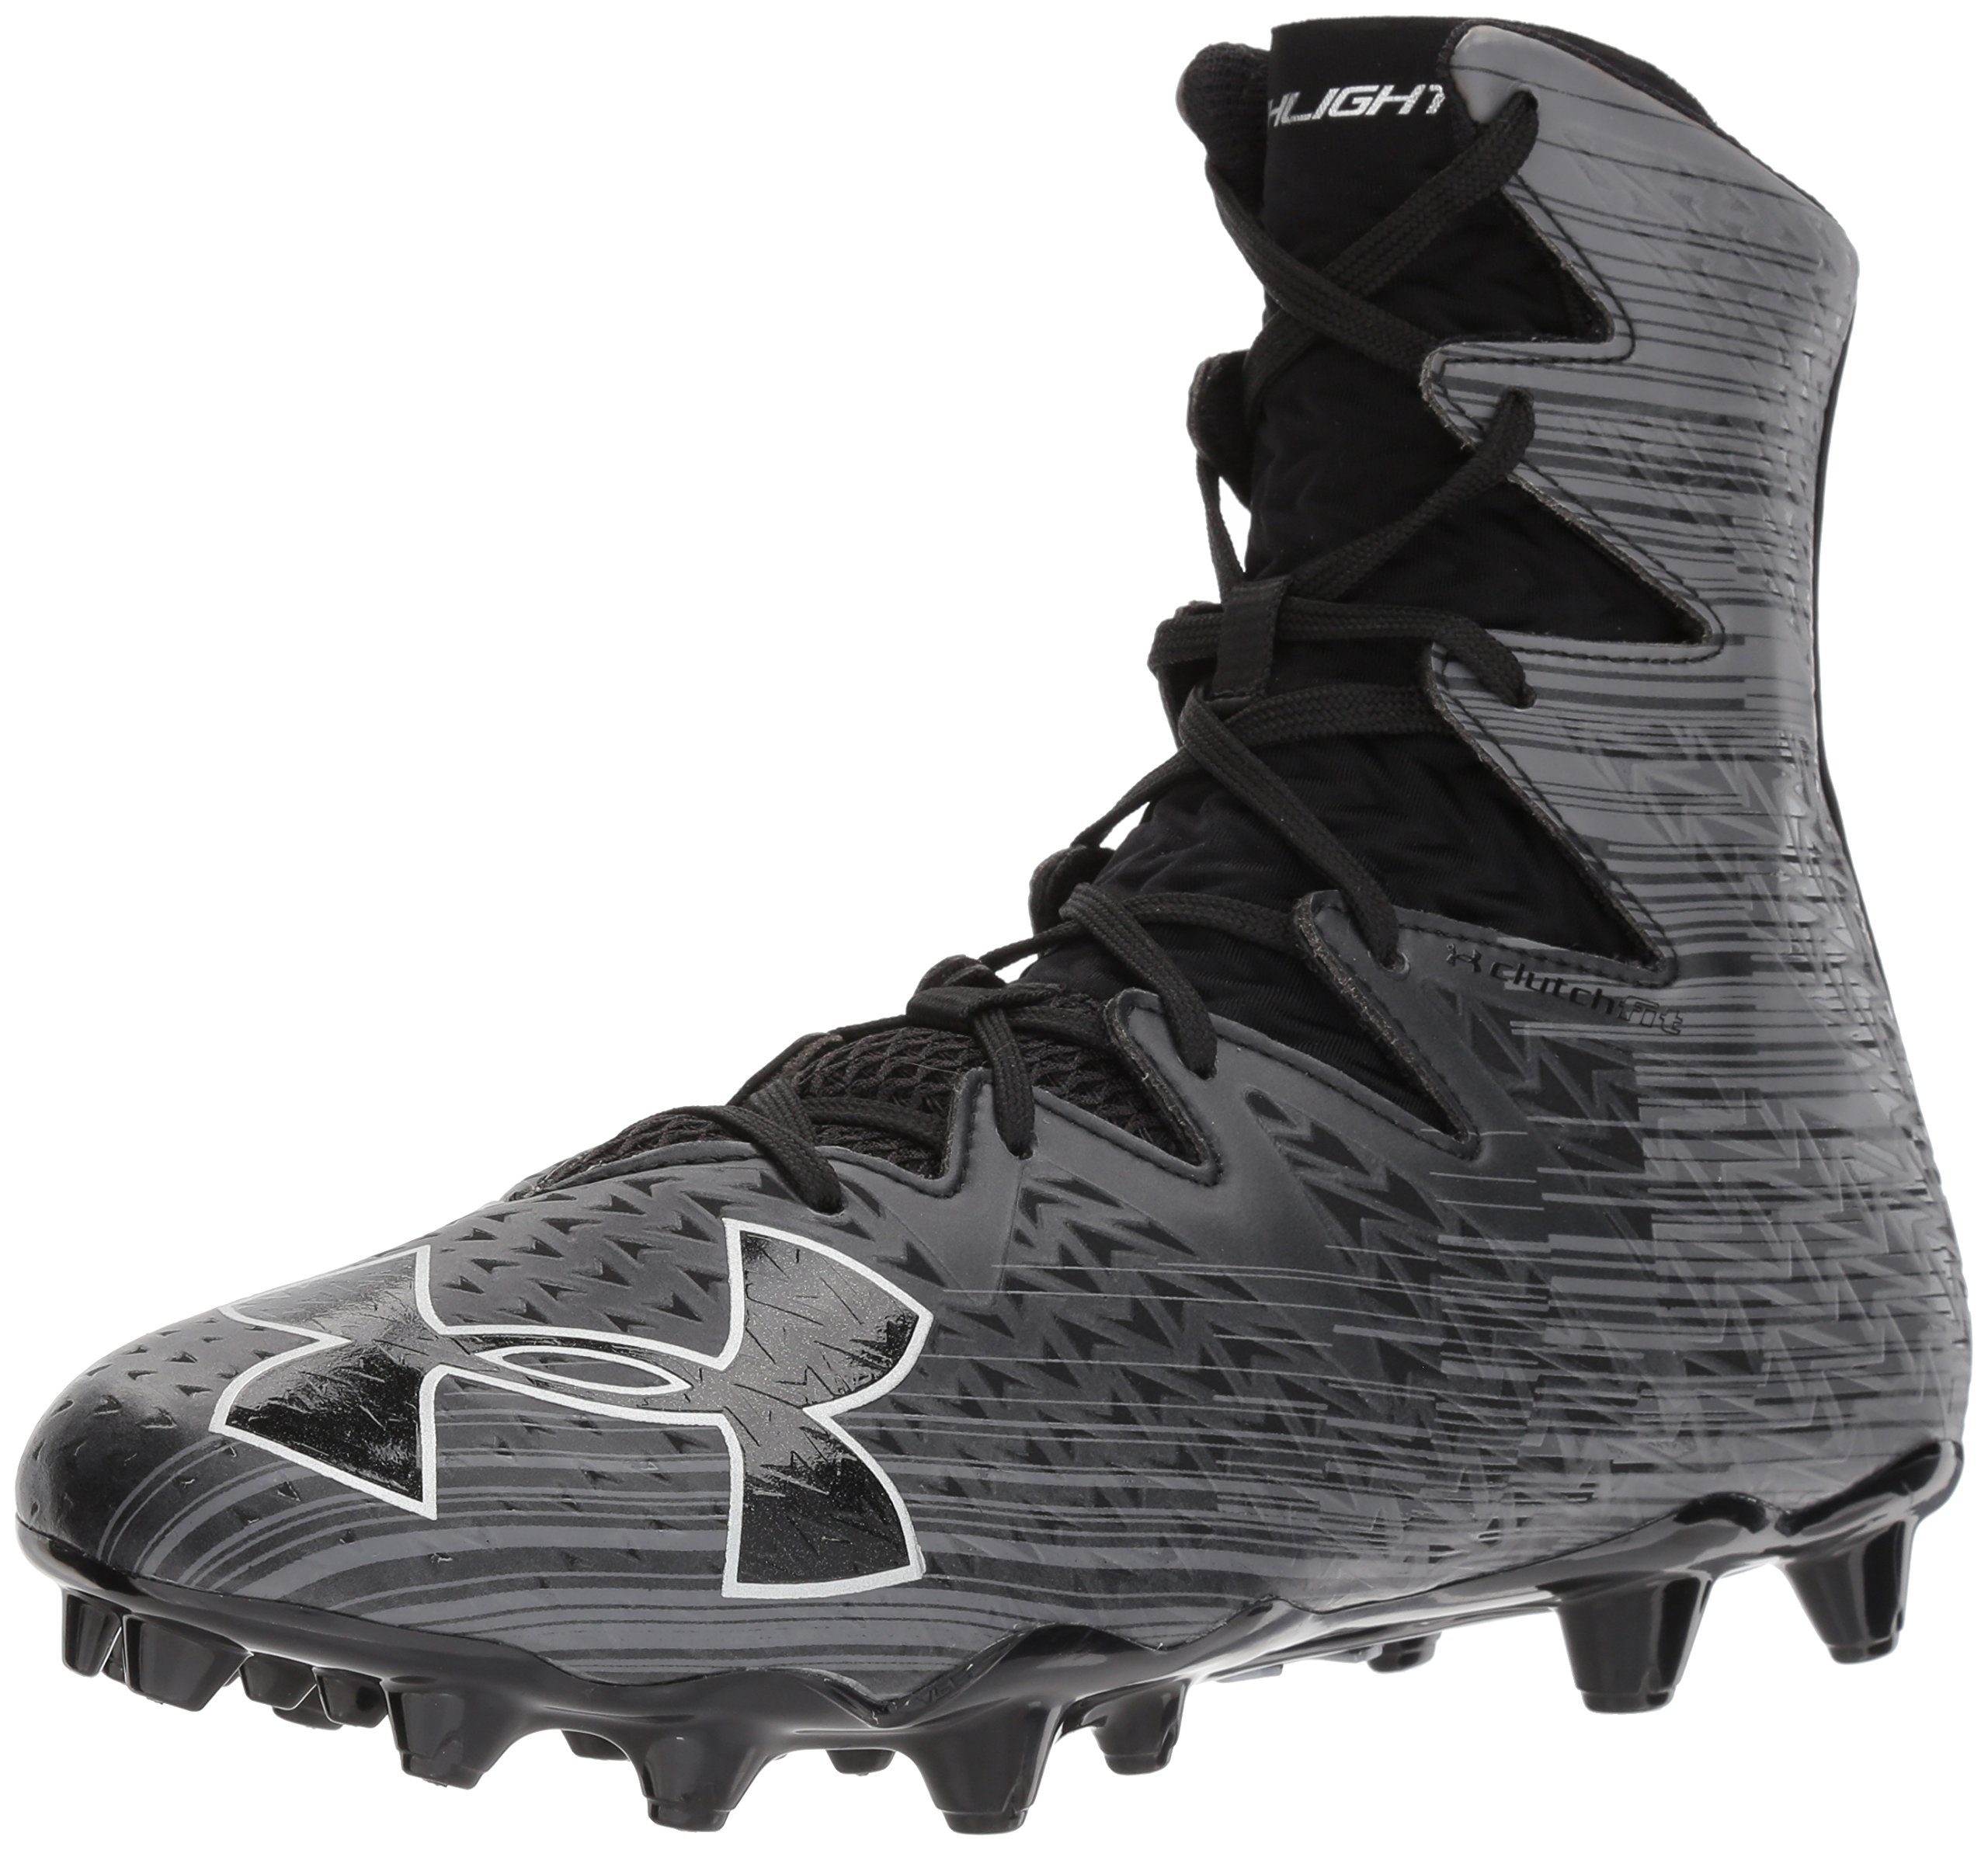 Under Armour Men's Highlight M.C. Lacrosse Shoe, Black (001)/Metallic Silver, 12.5 by Under Armour